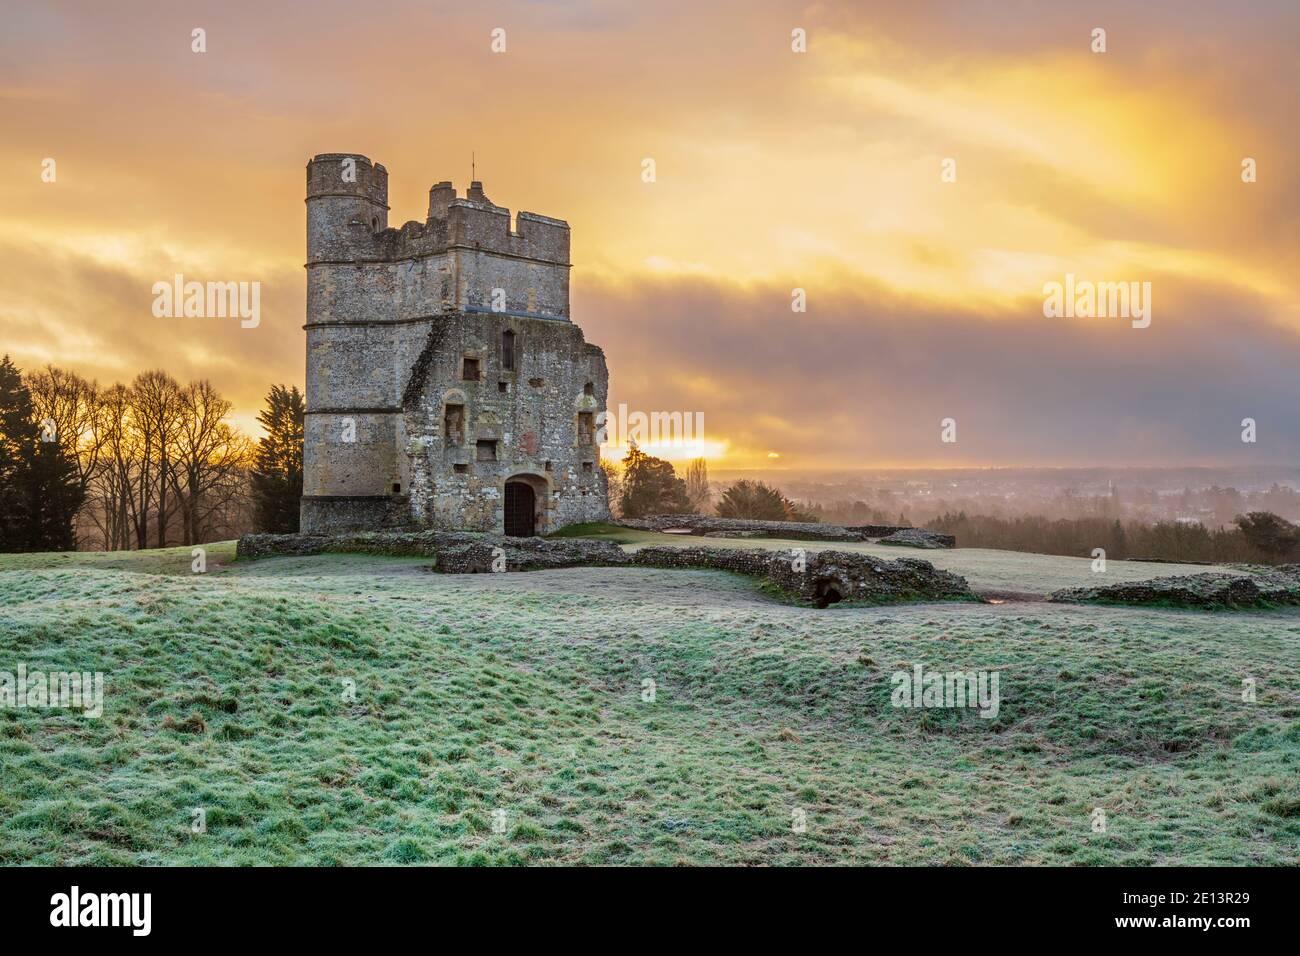 Donnington Castle in winter frost at sunrise, Newbury, Berkshire, England, United Kingdom, Europe Stock Photo